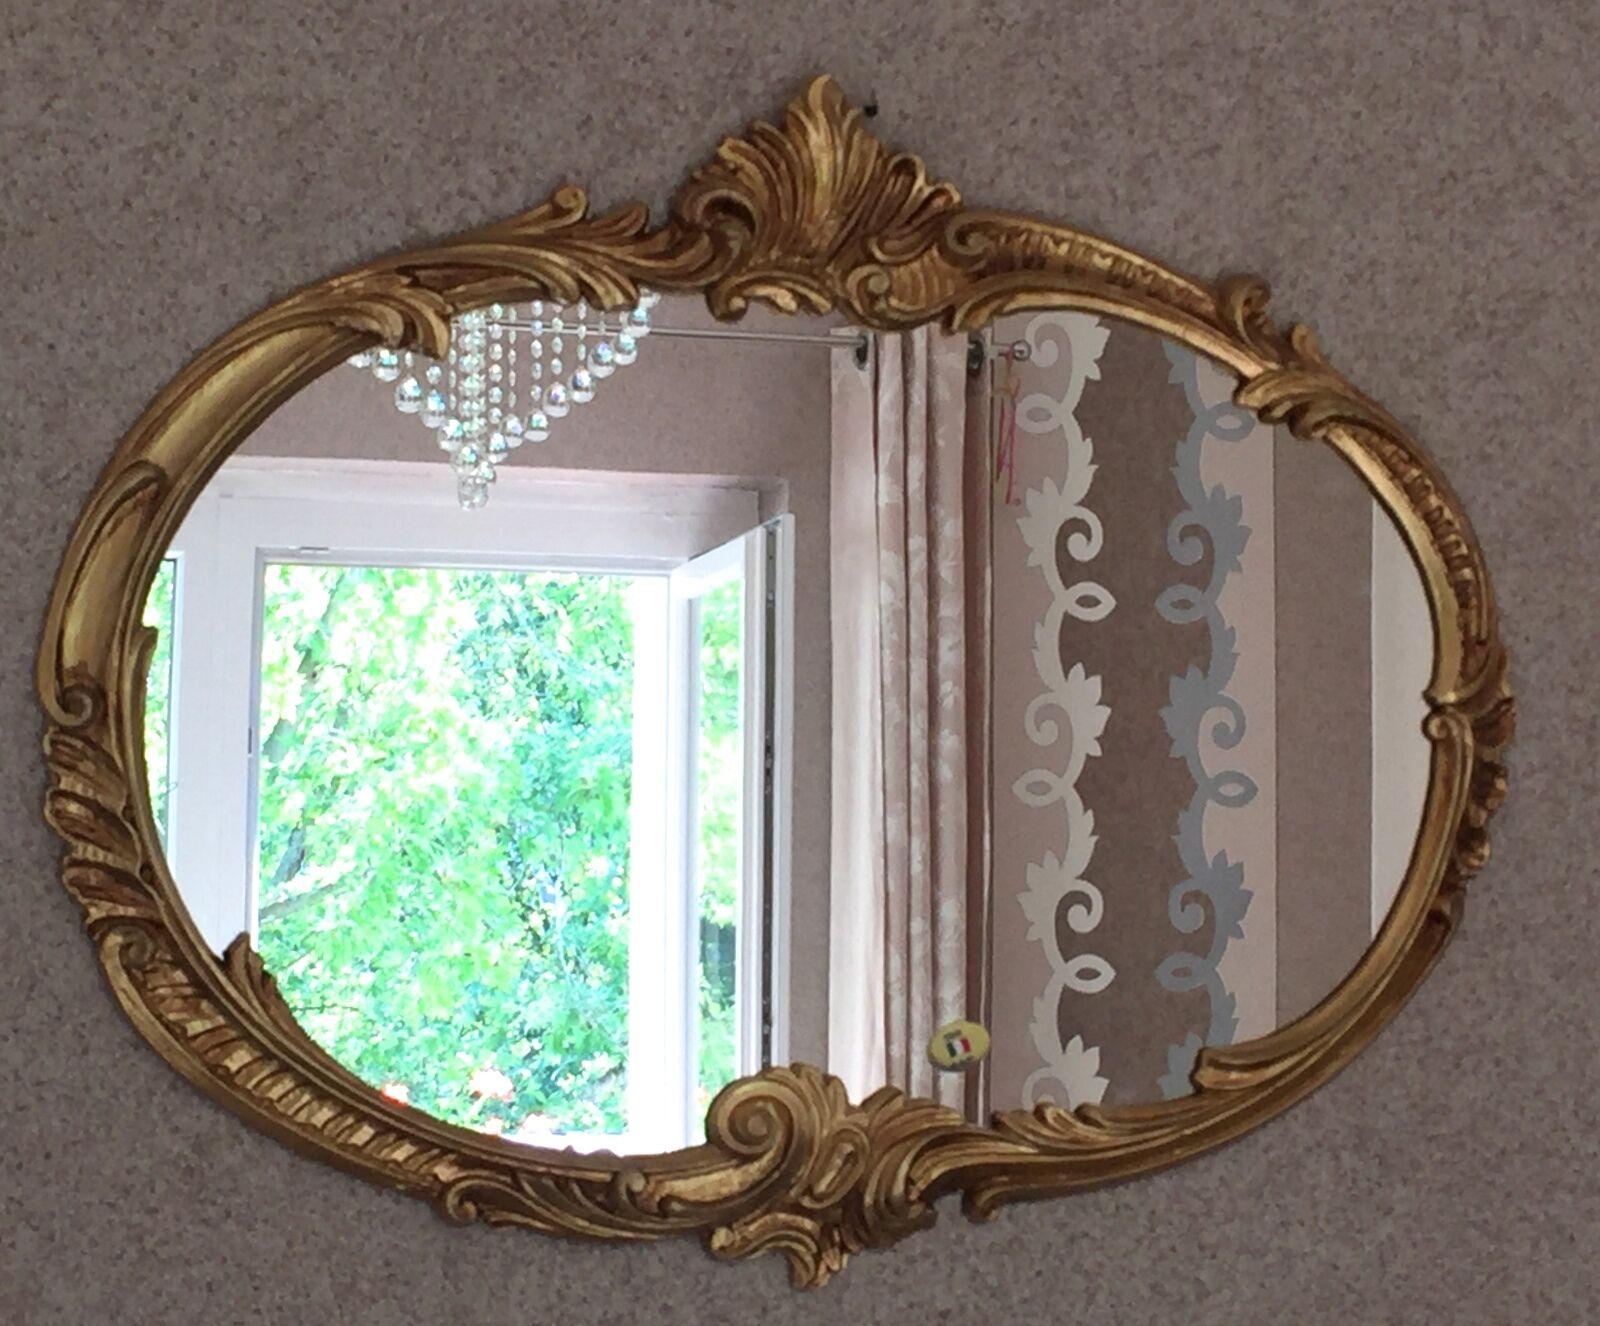 Wandspiegel barock oval antik gold 52x42 badspiegel vintage ovaler spiegel eur 54 90 picclick de - Wandspiegel oval ...